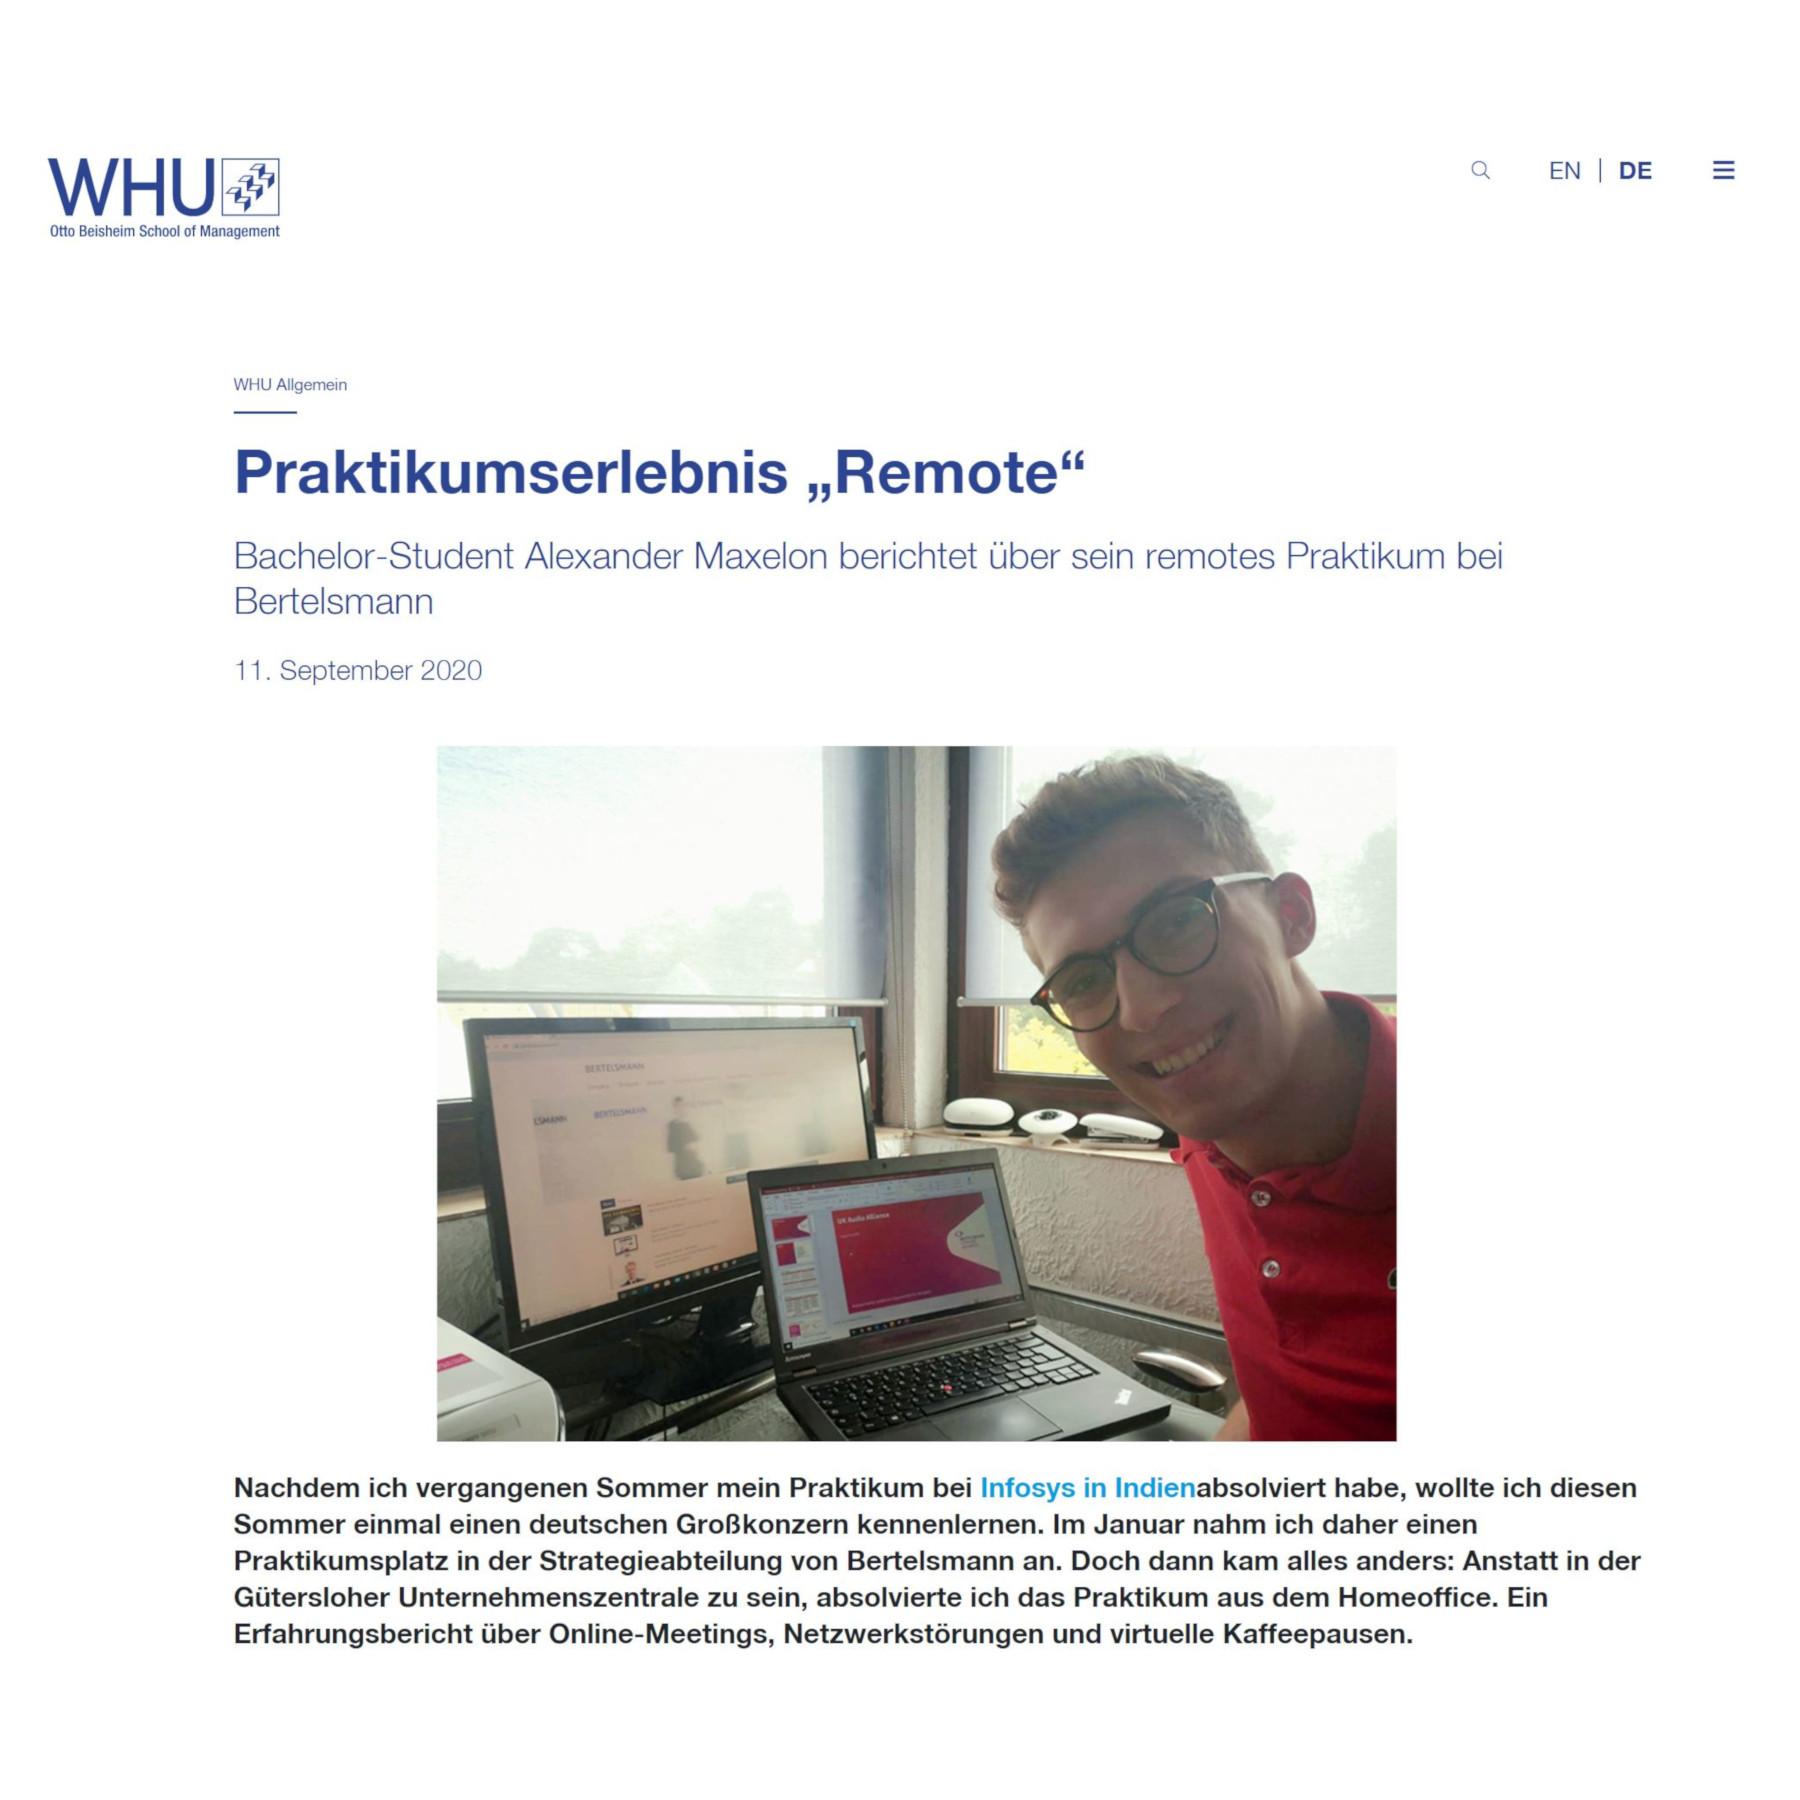 Bertelsmann Praktikumserlebnis Remote